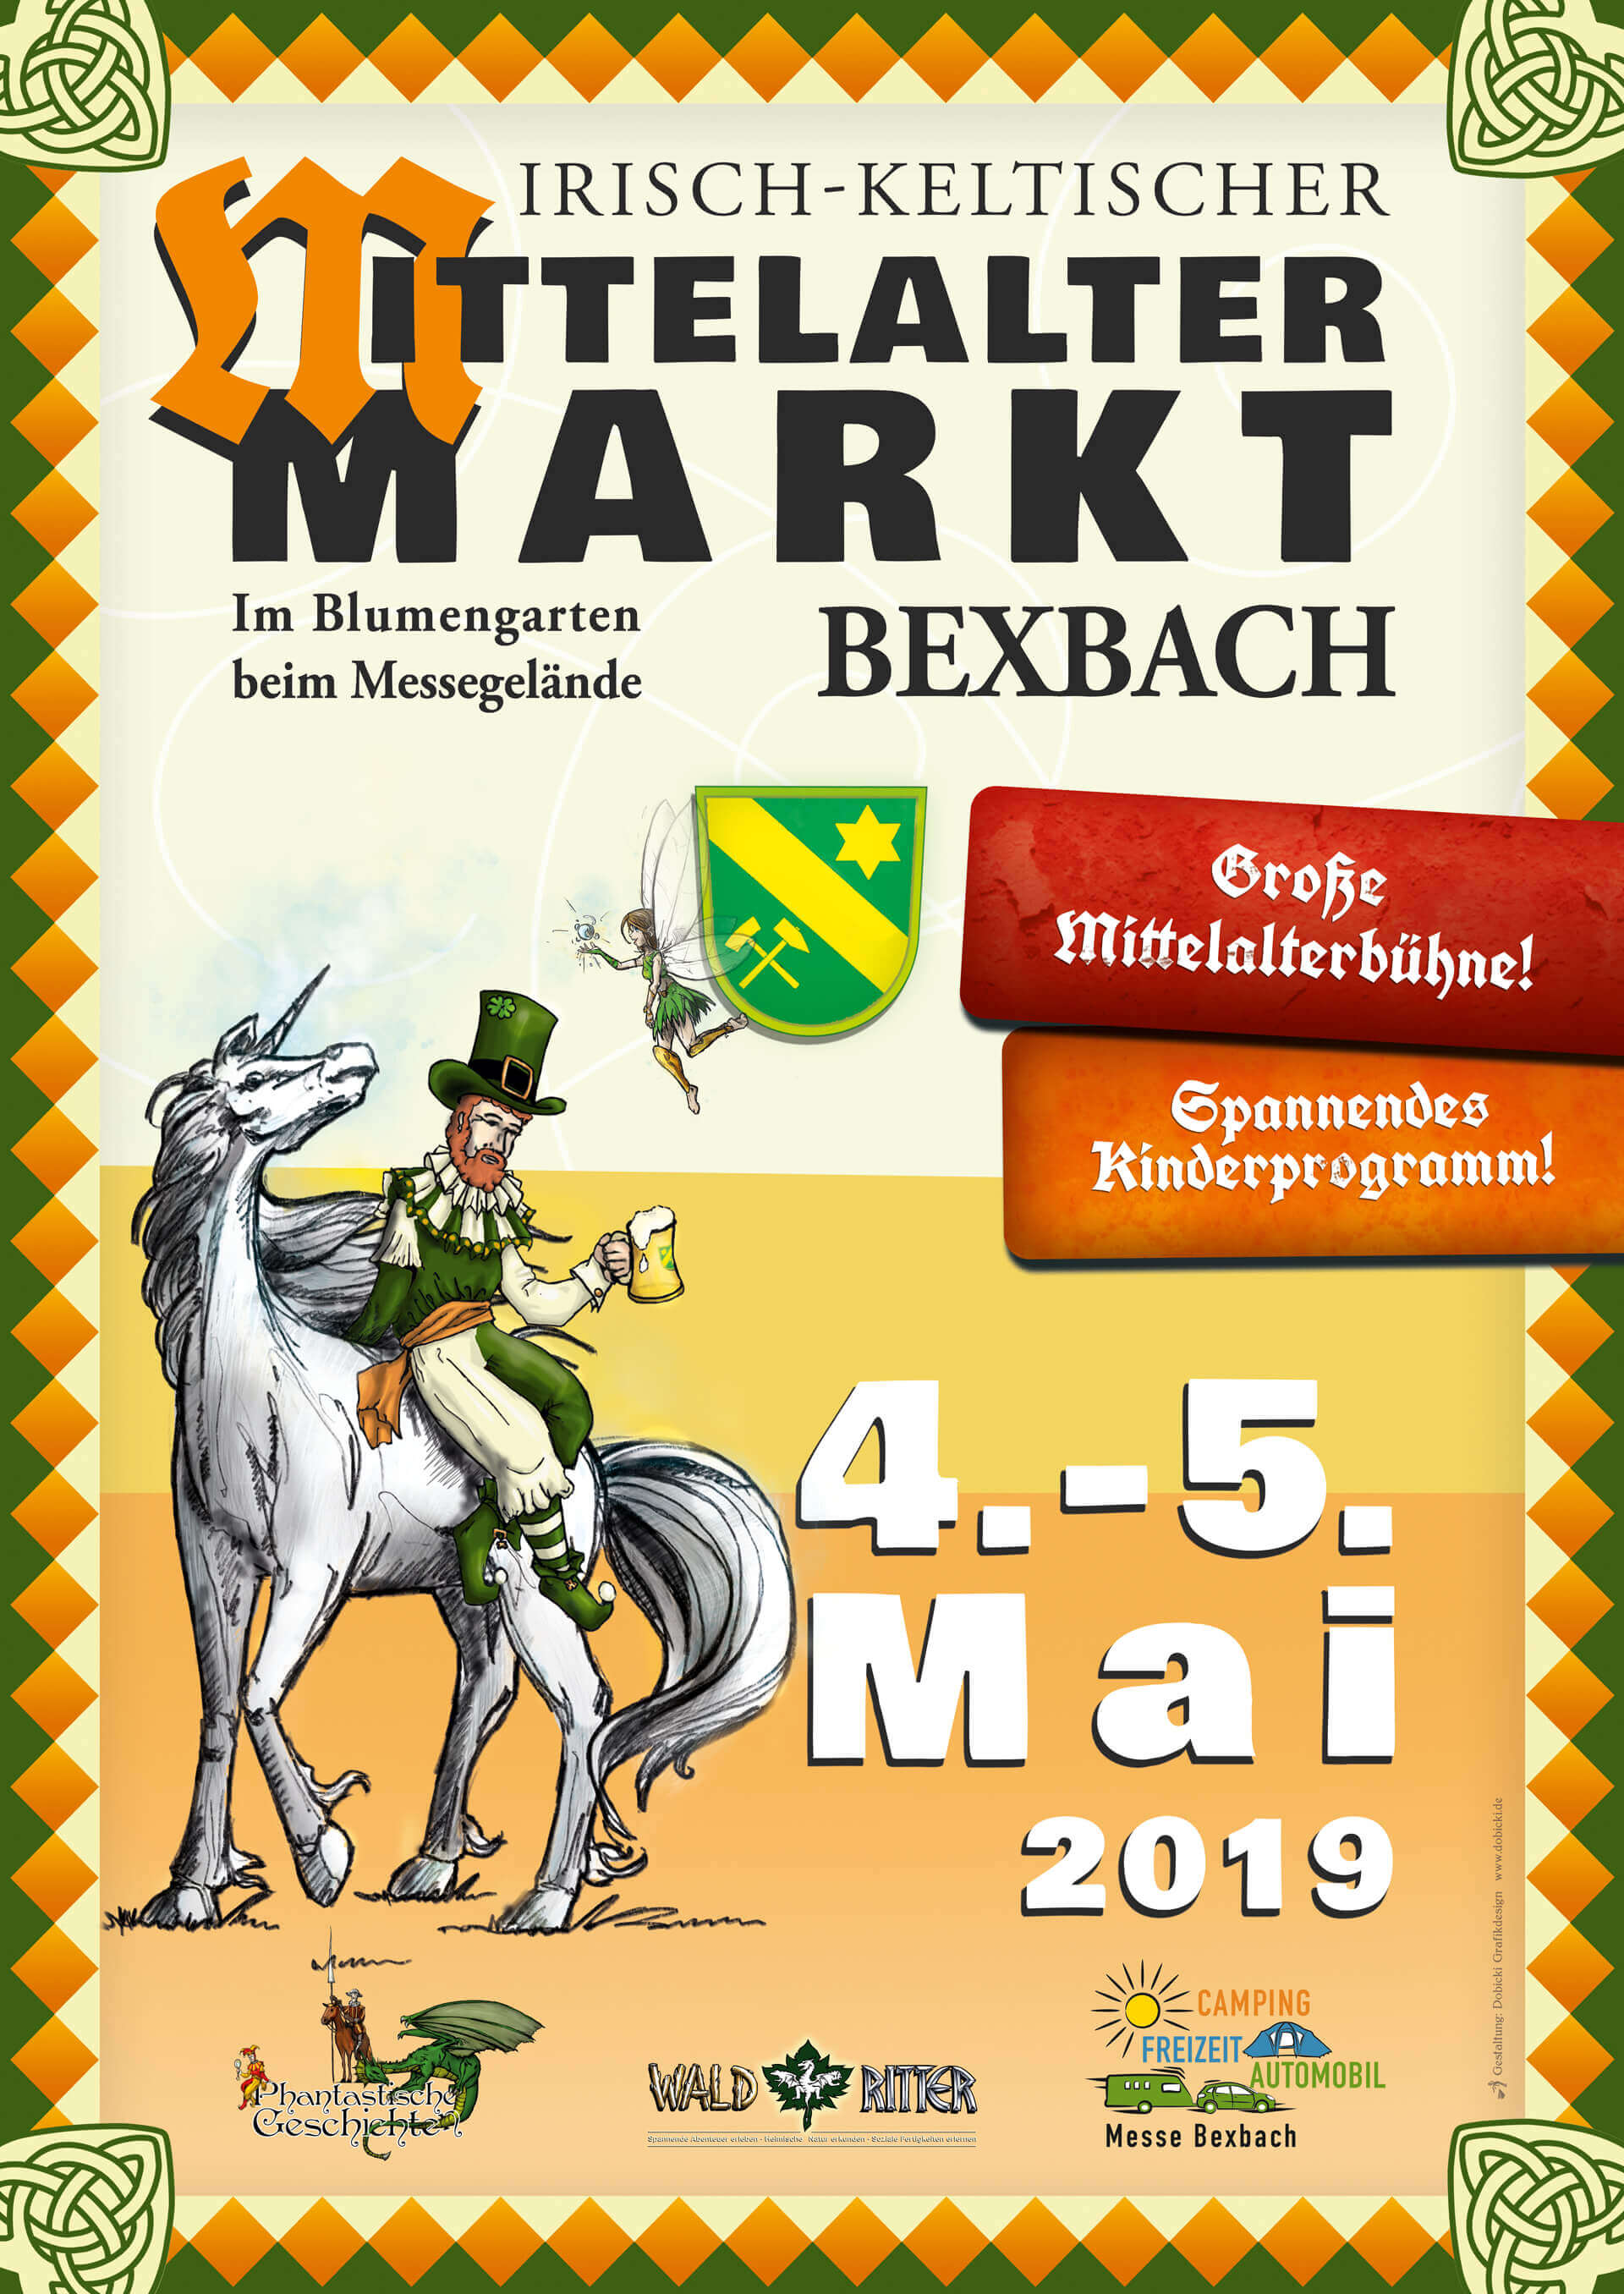 ma markt bexbach 2019  plakat   3